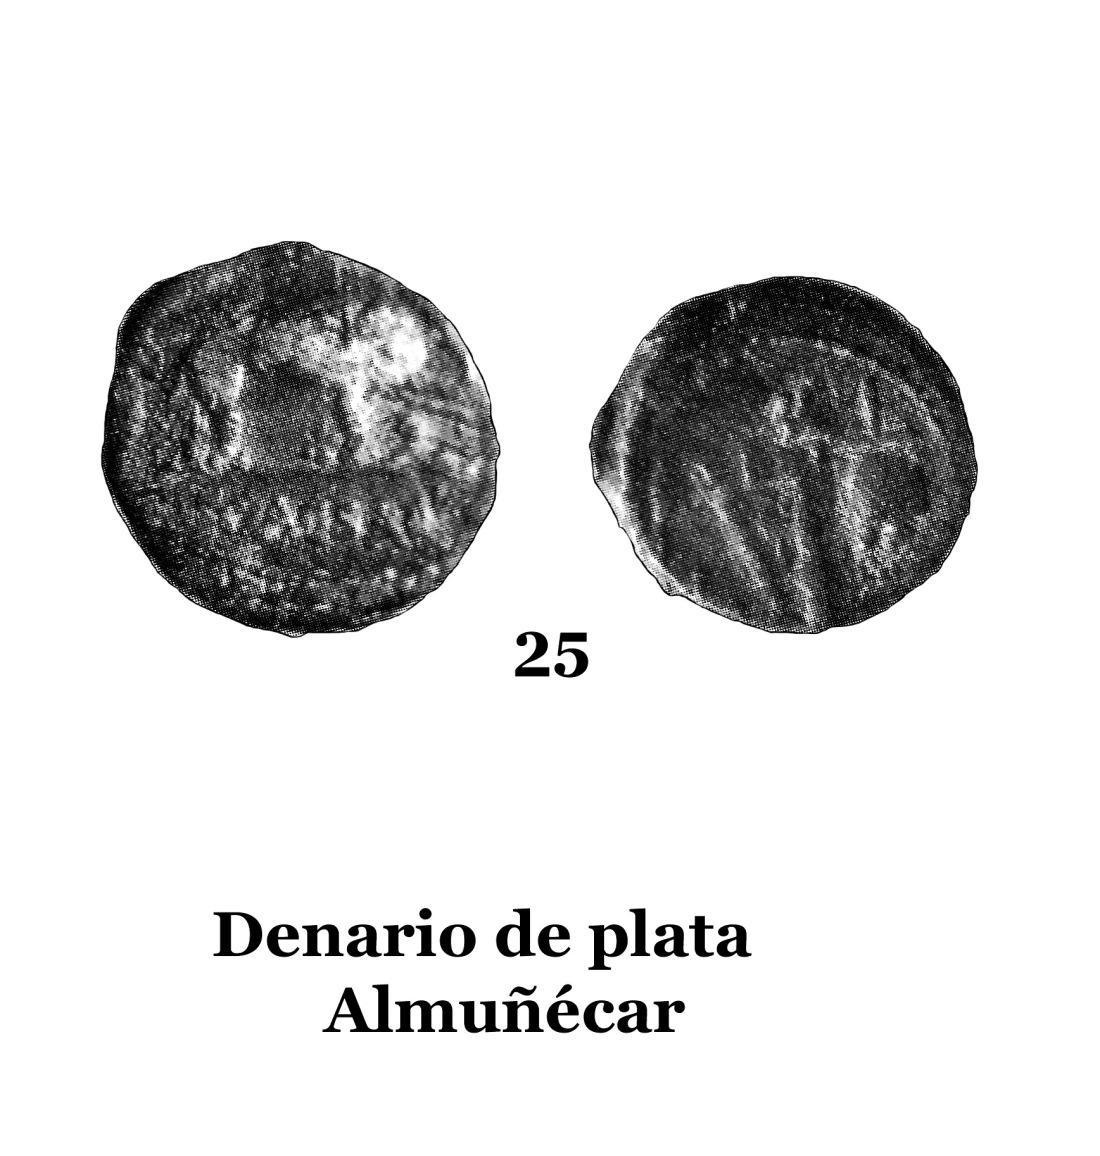 25Denario de plata de Almuñécar 25